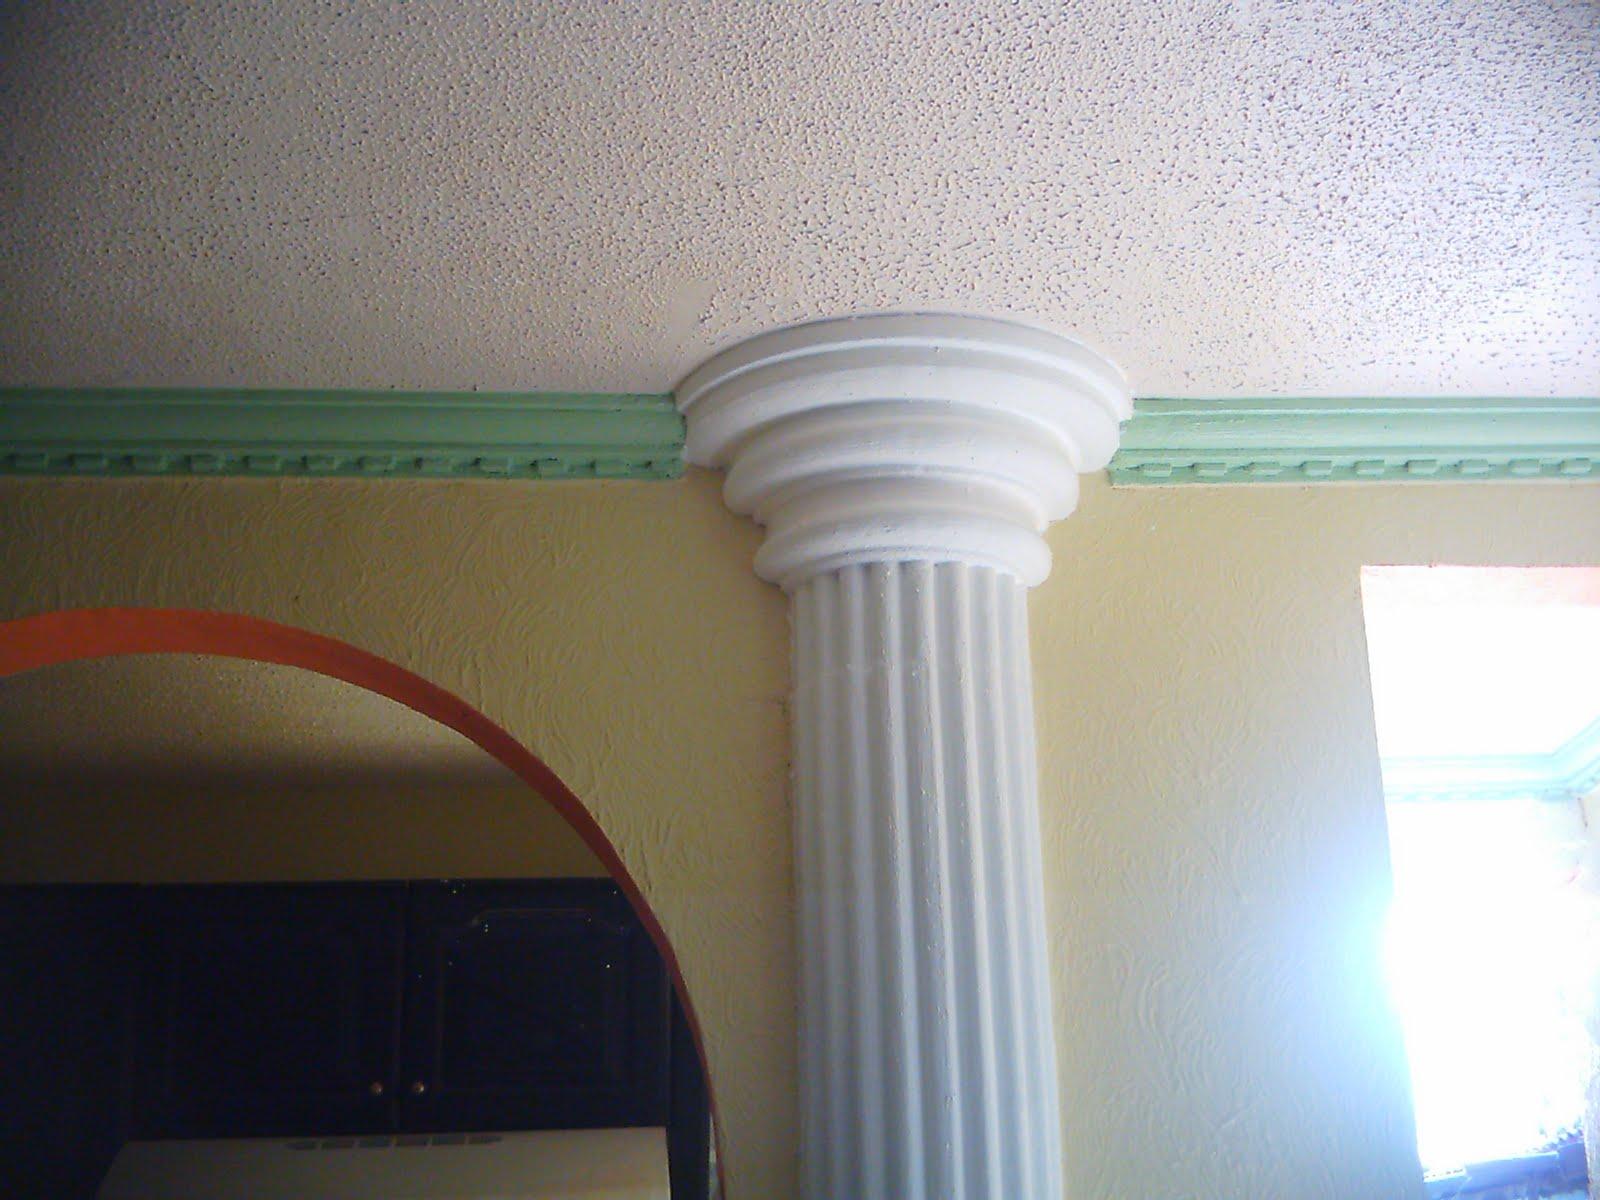 Molduras de unisel derrust molduras para interior y exterior - Molduras para exteriores ...